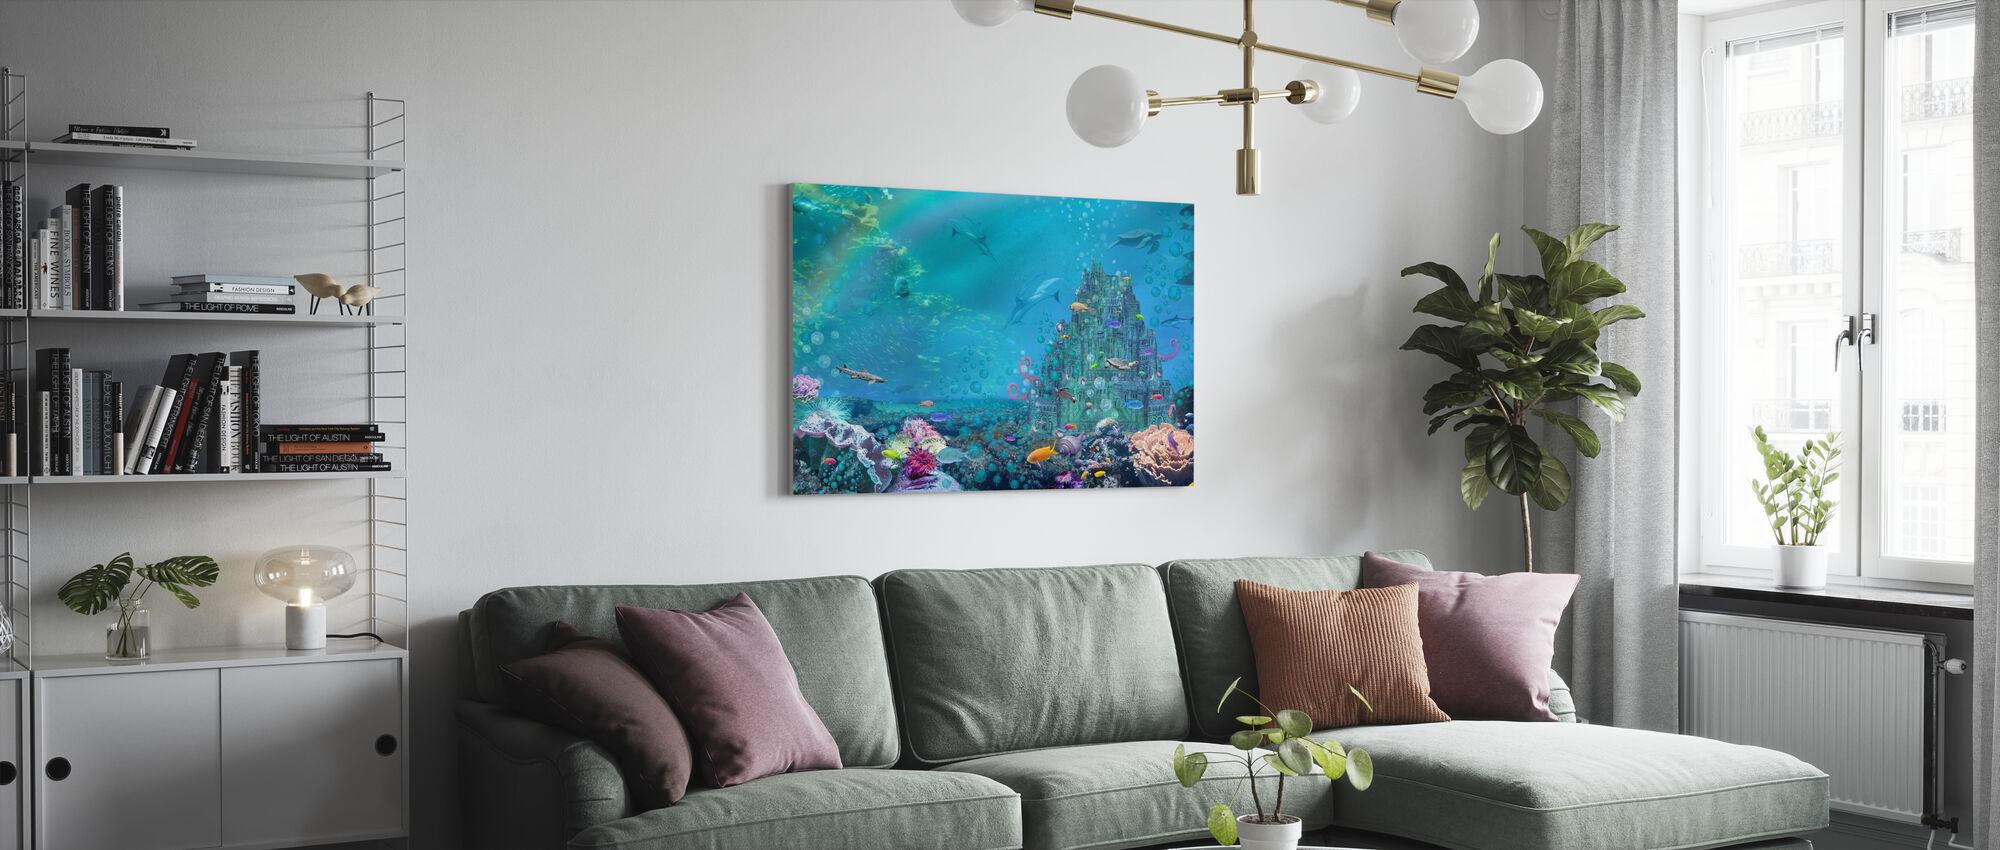 Underwater Castle - Canvas print - Living Room